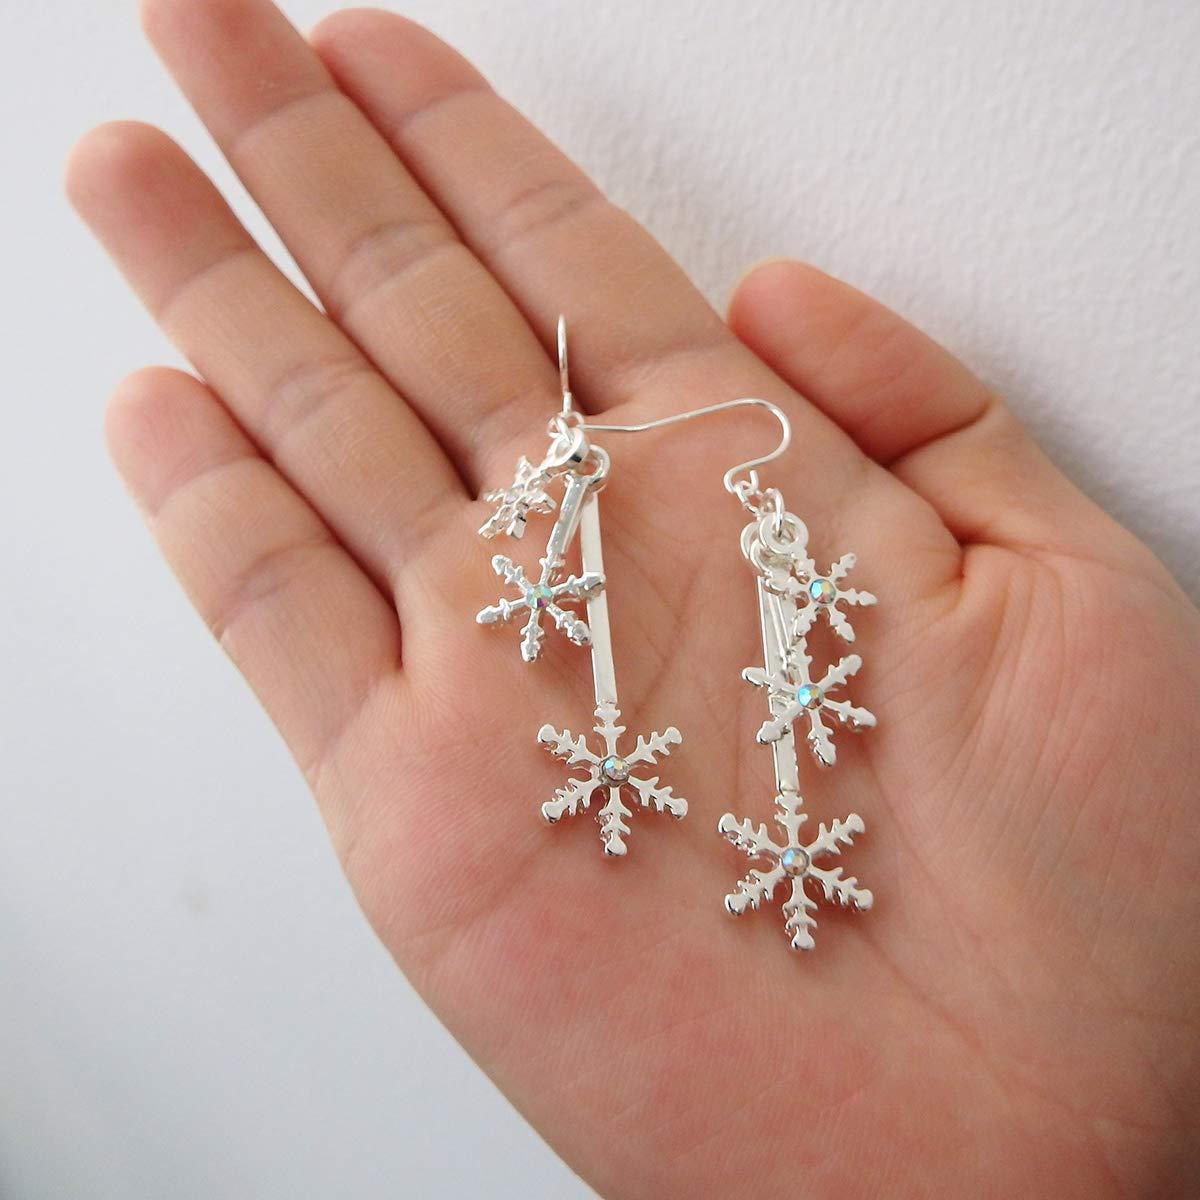 Christmas Snowflake Piercing Dangle Earrings Lightweight CZ Rhinestone Alloy Silver Women Girl XMAS Gift